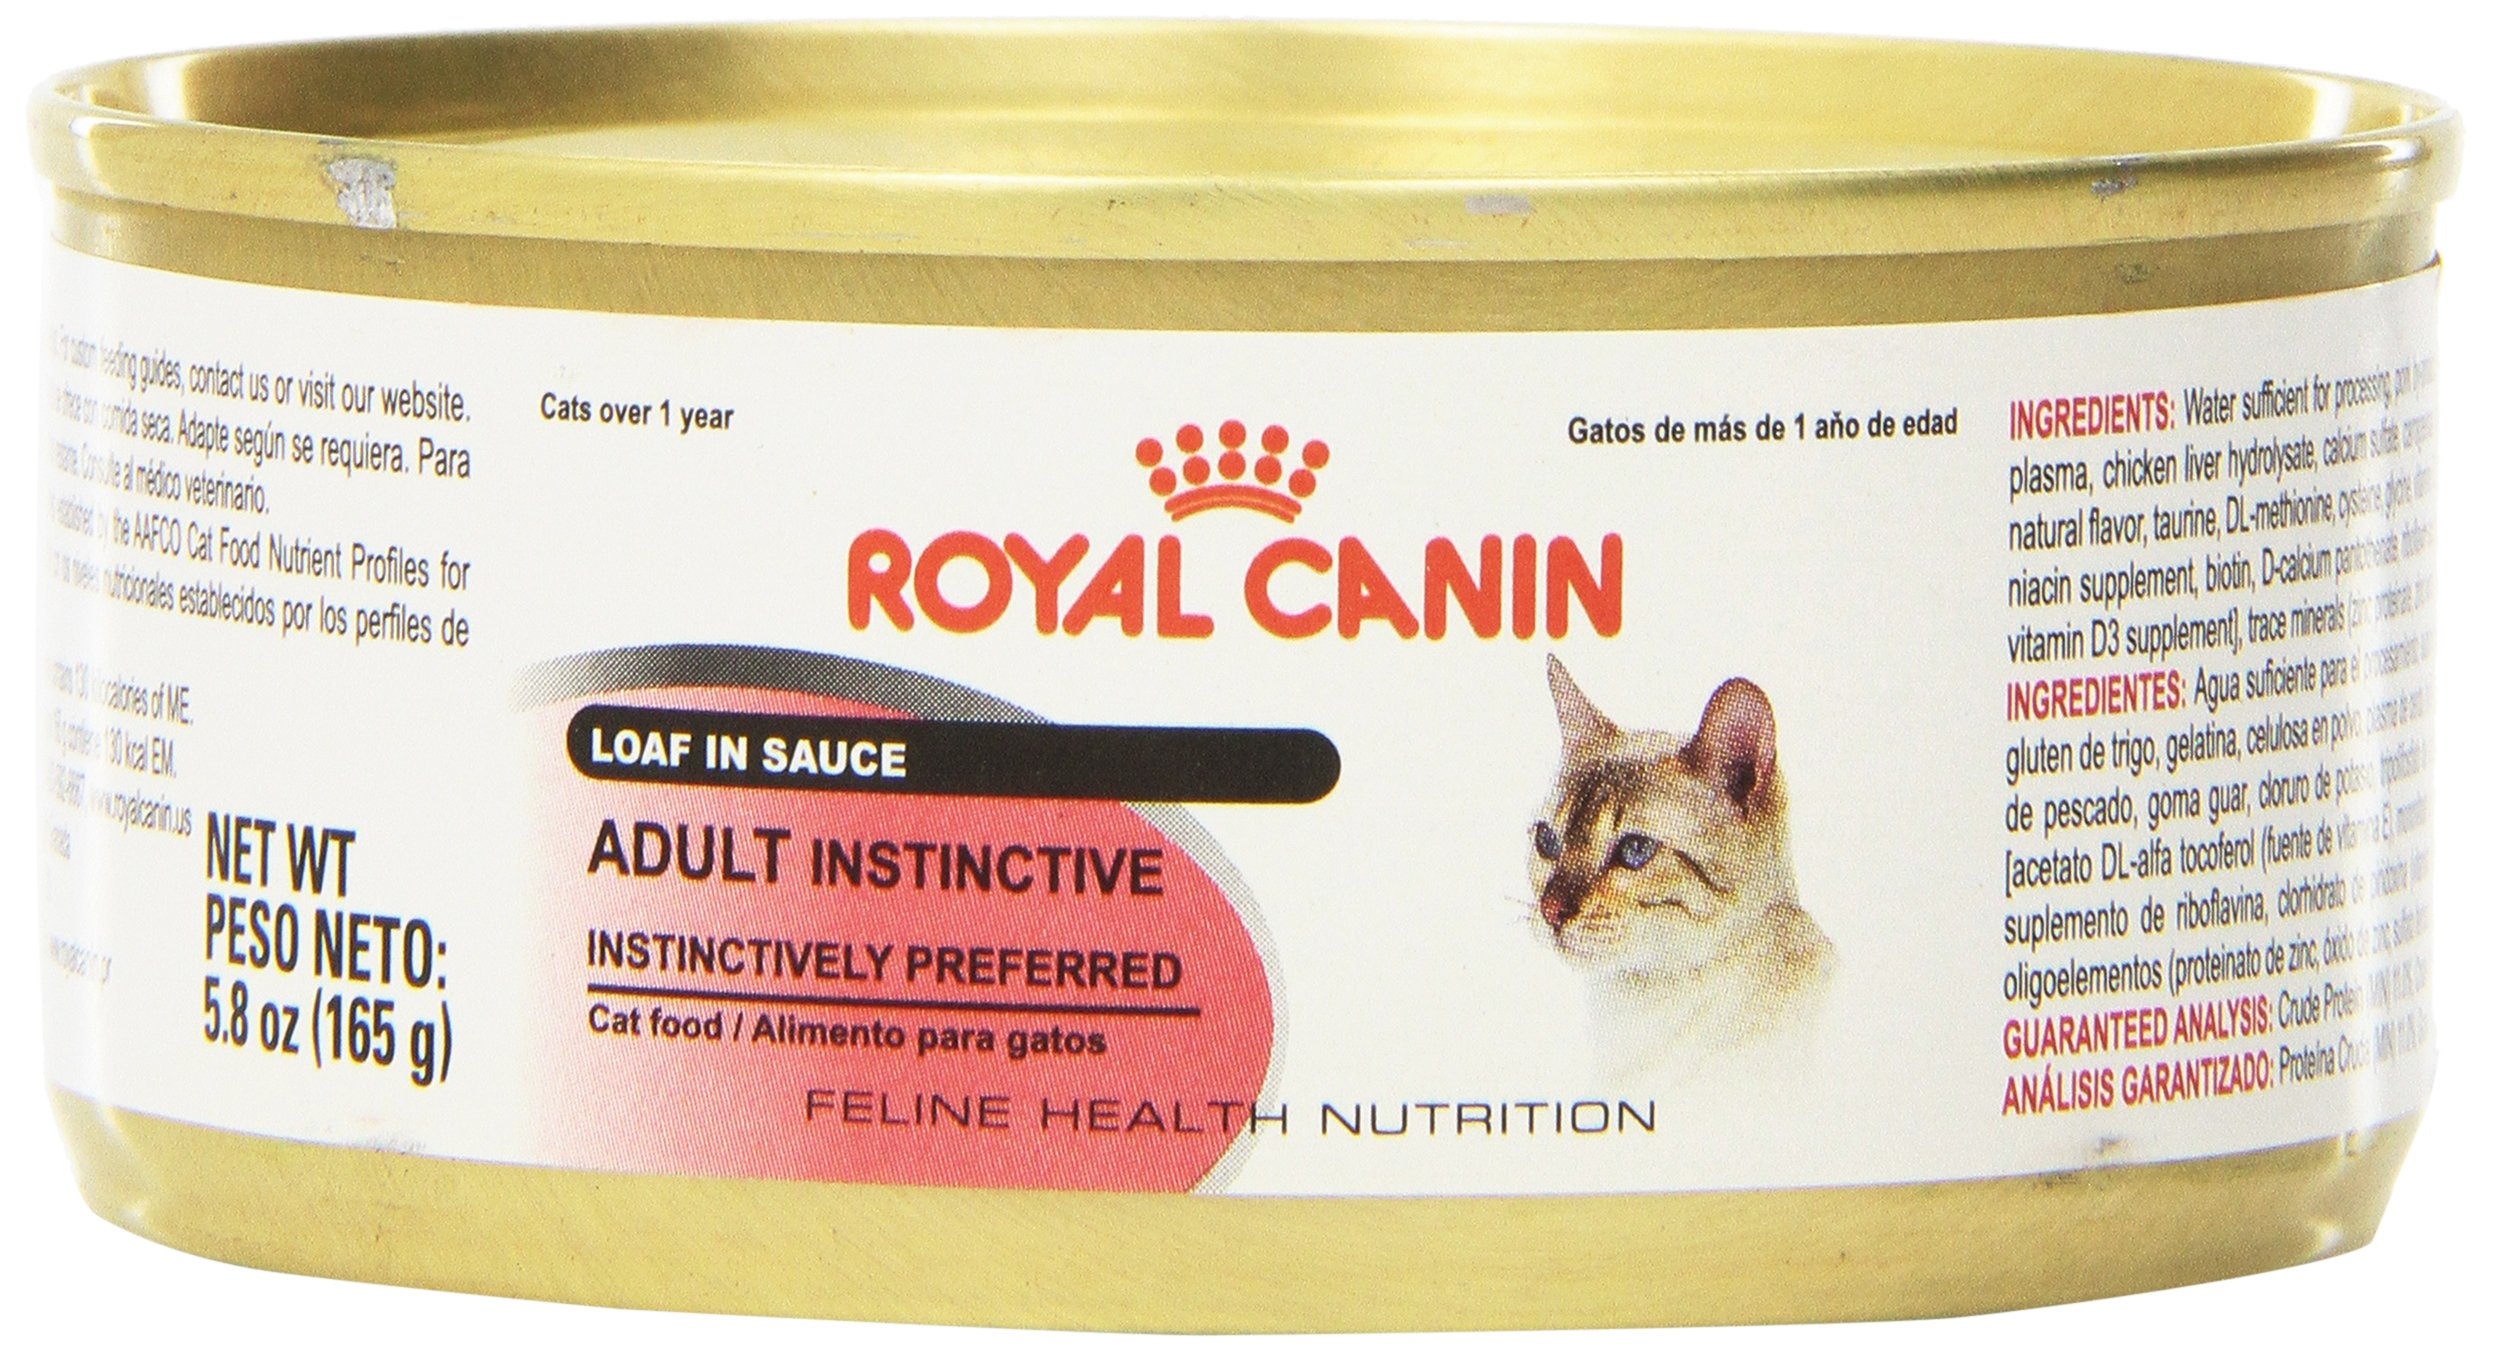 Royal Canin Feline Health Nutrition Adult Instinctive Loaf in Sauce Canned Cat Food (24 Pack), 5.8 oz/One Size